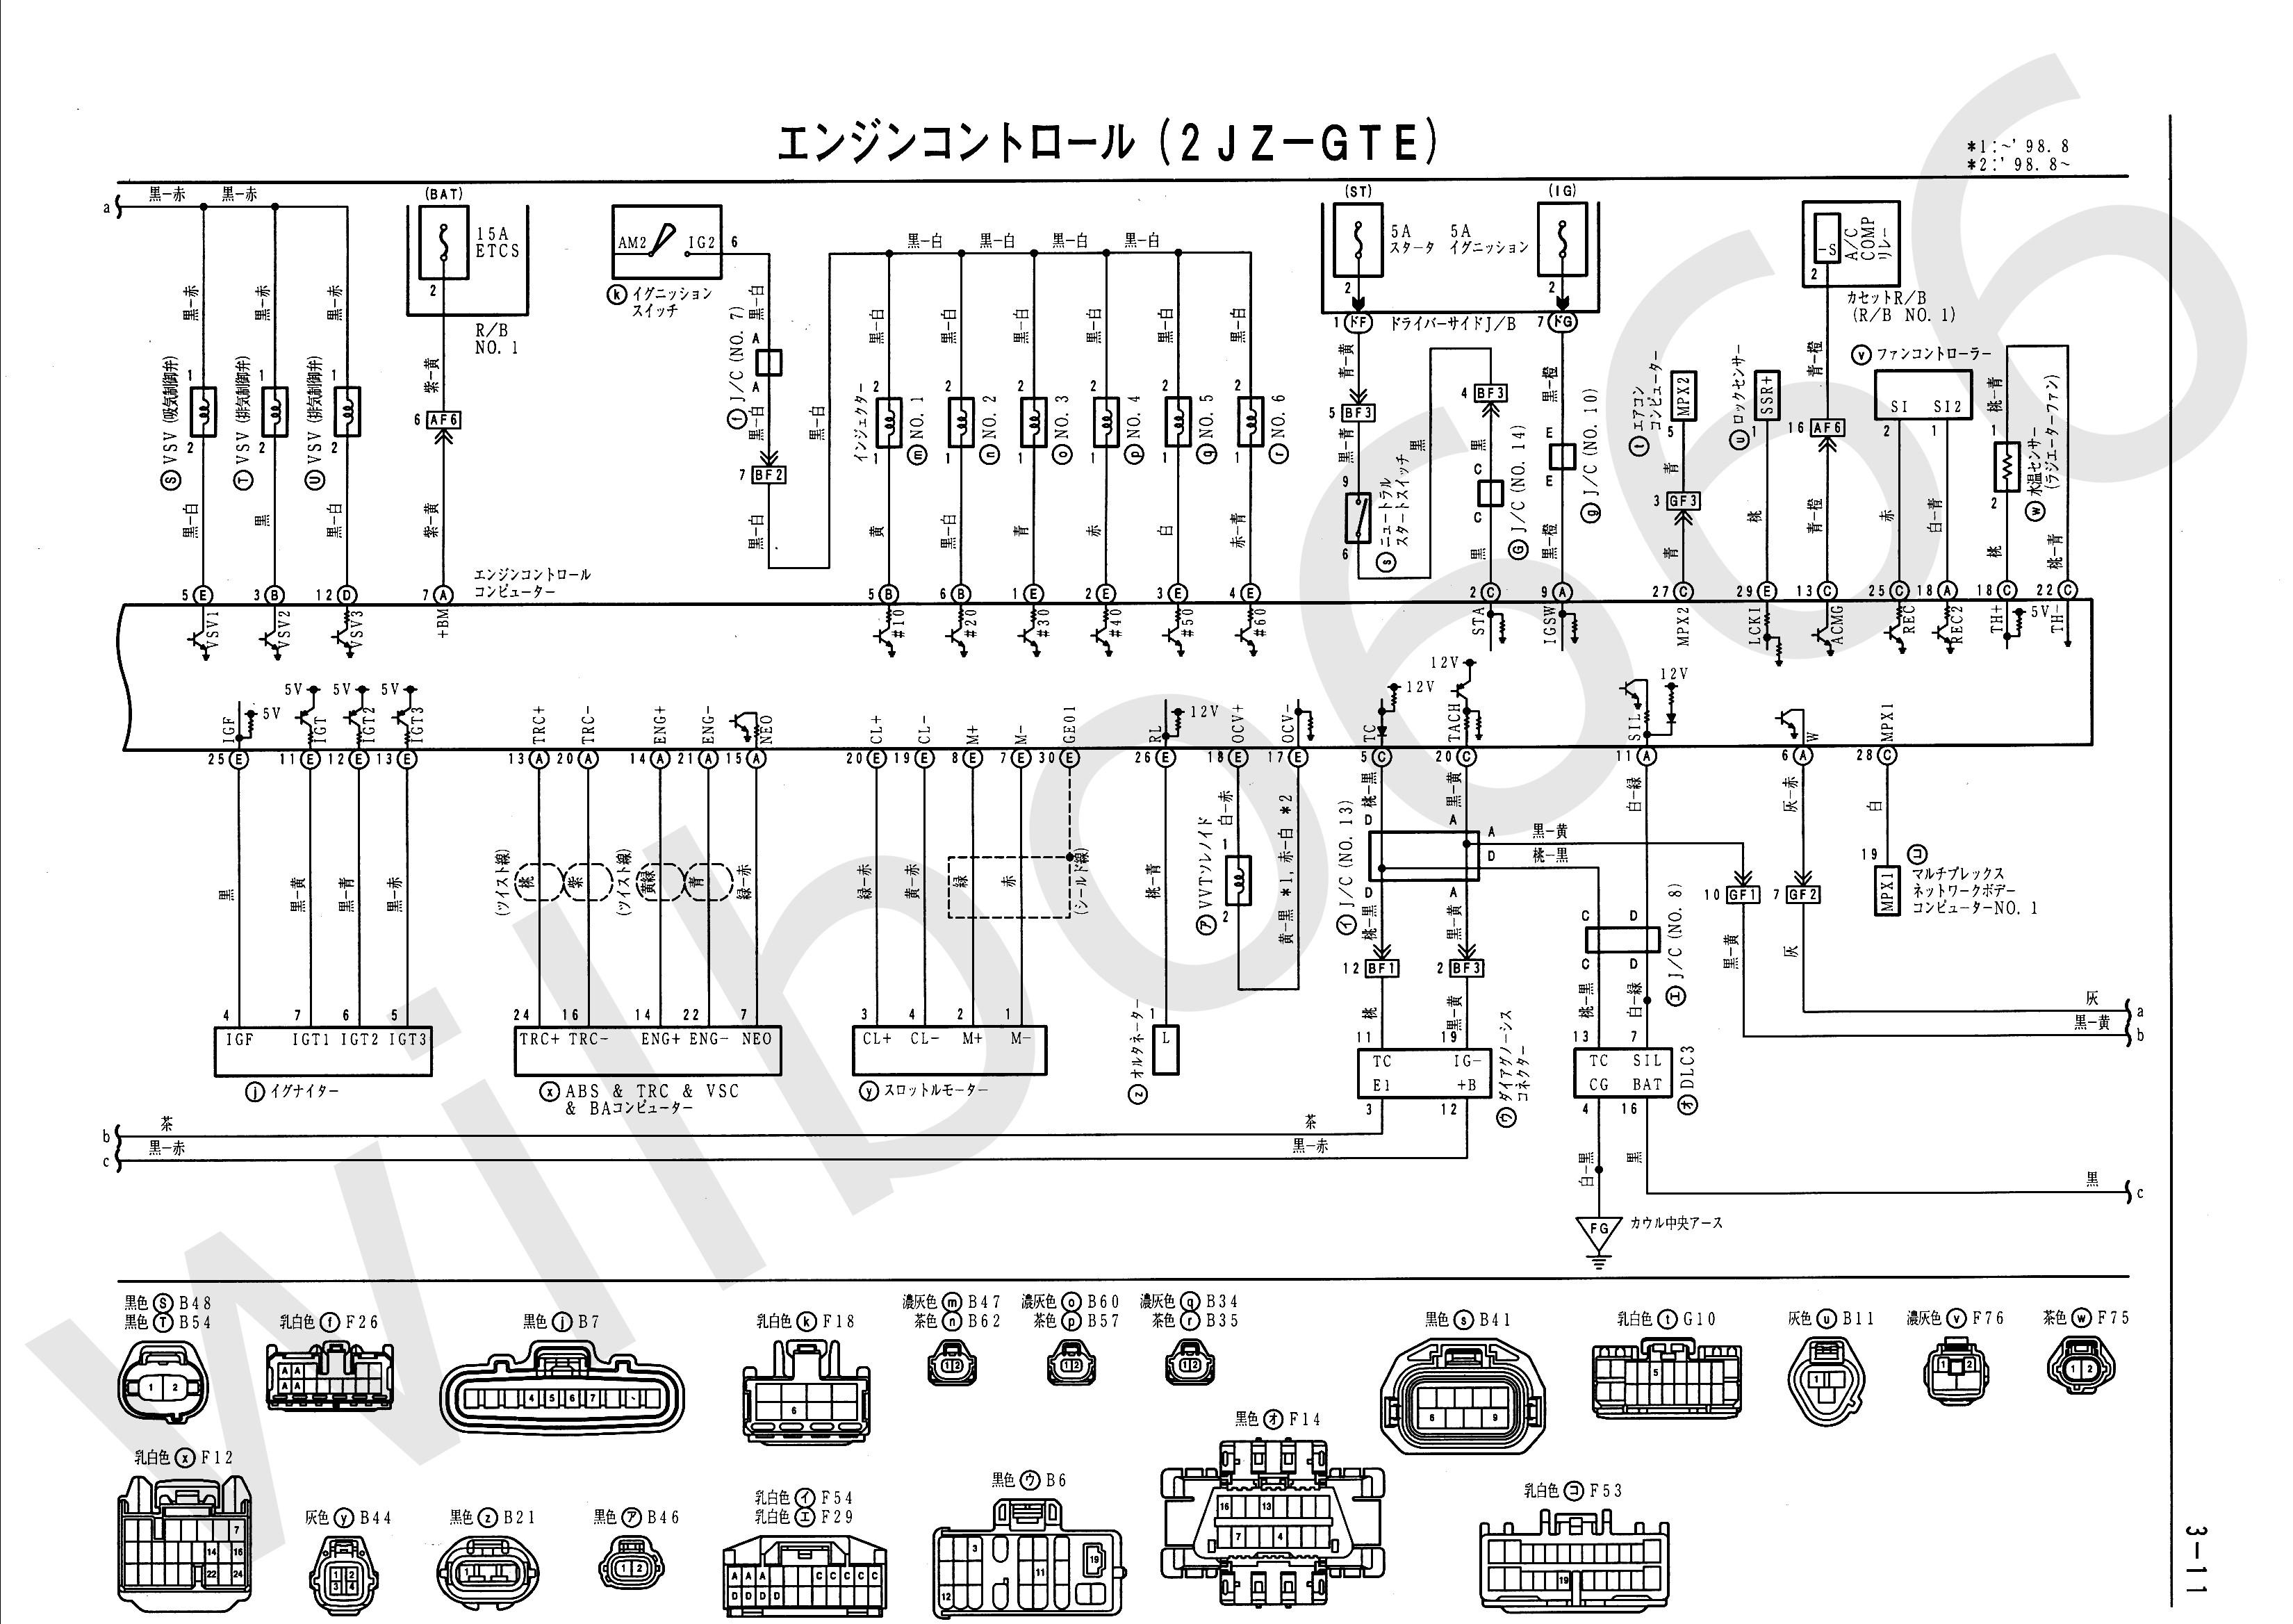 JZS161 Toyota Aristo 2JZ GTE VVTi Wiring Diagrams